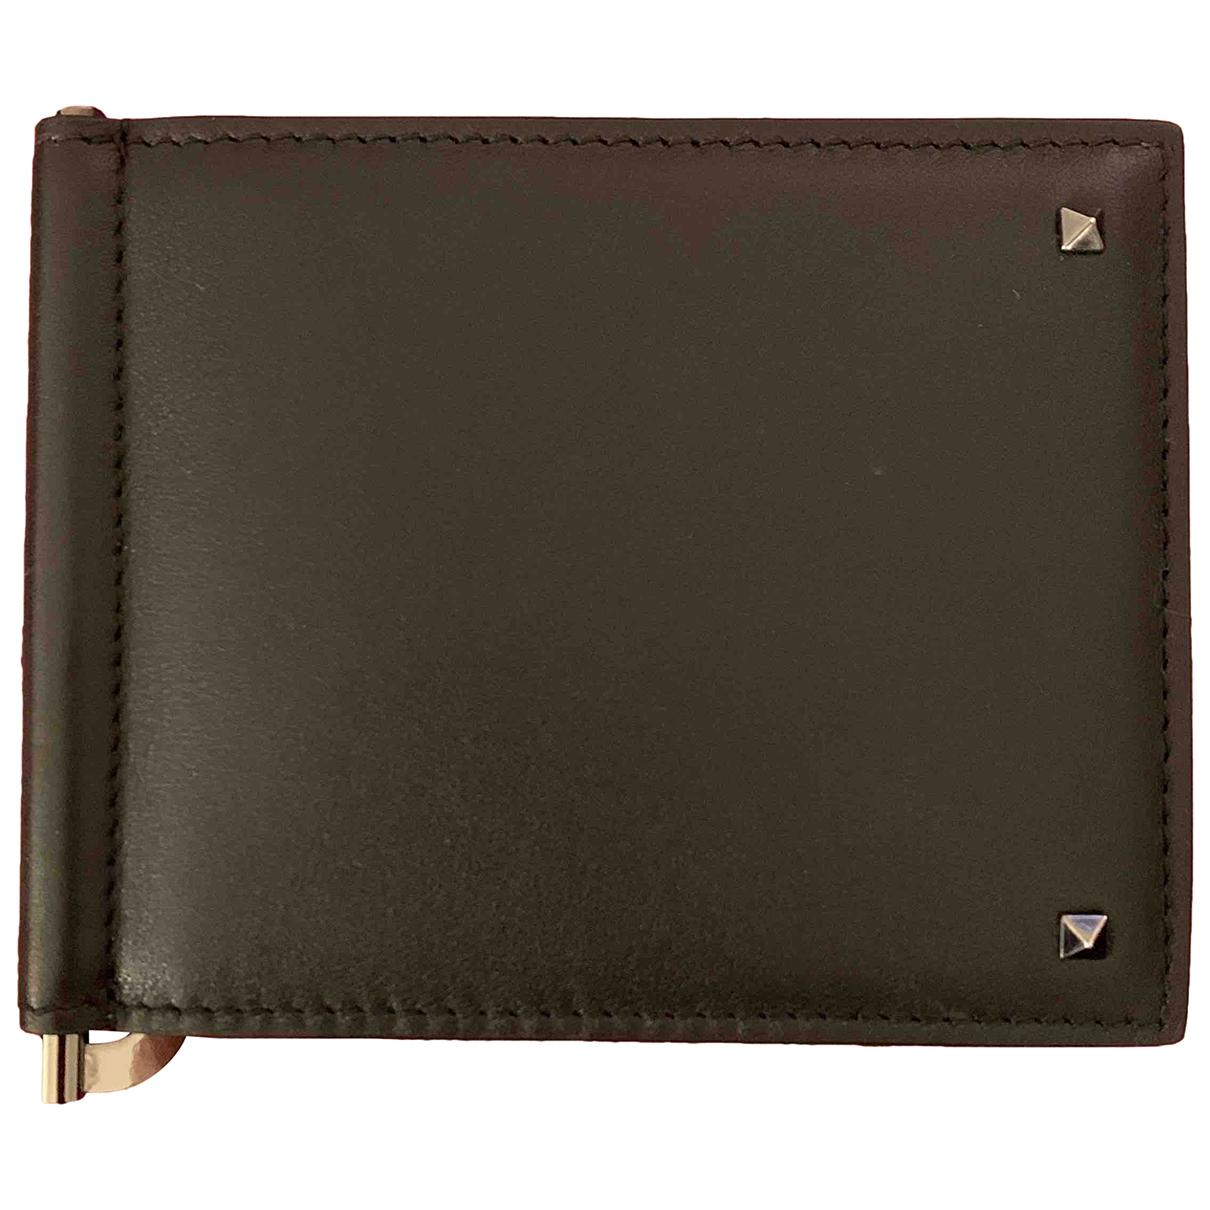 Valentino Garavani \N Black Leather Small bag, wallet & cases for Men \N